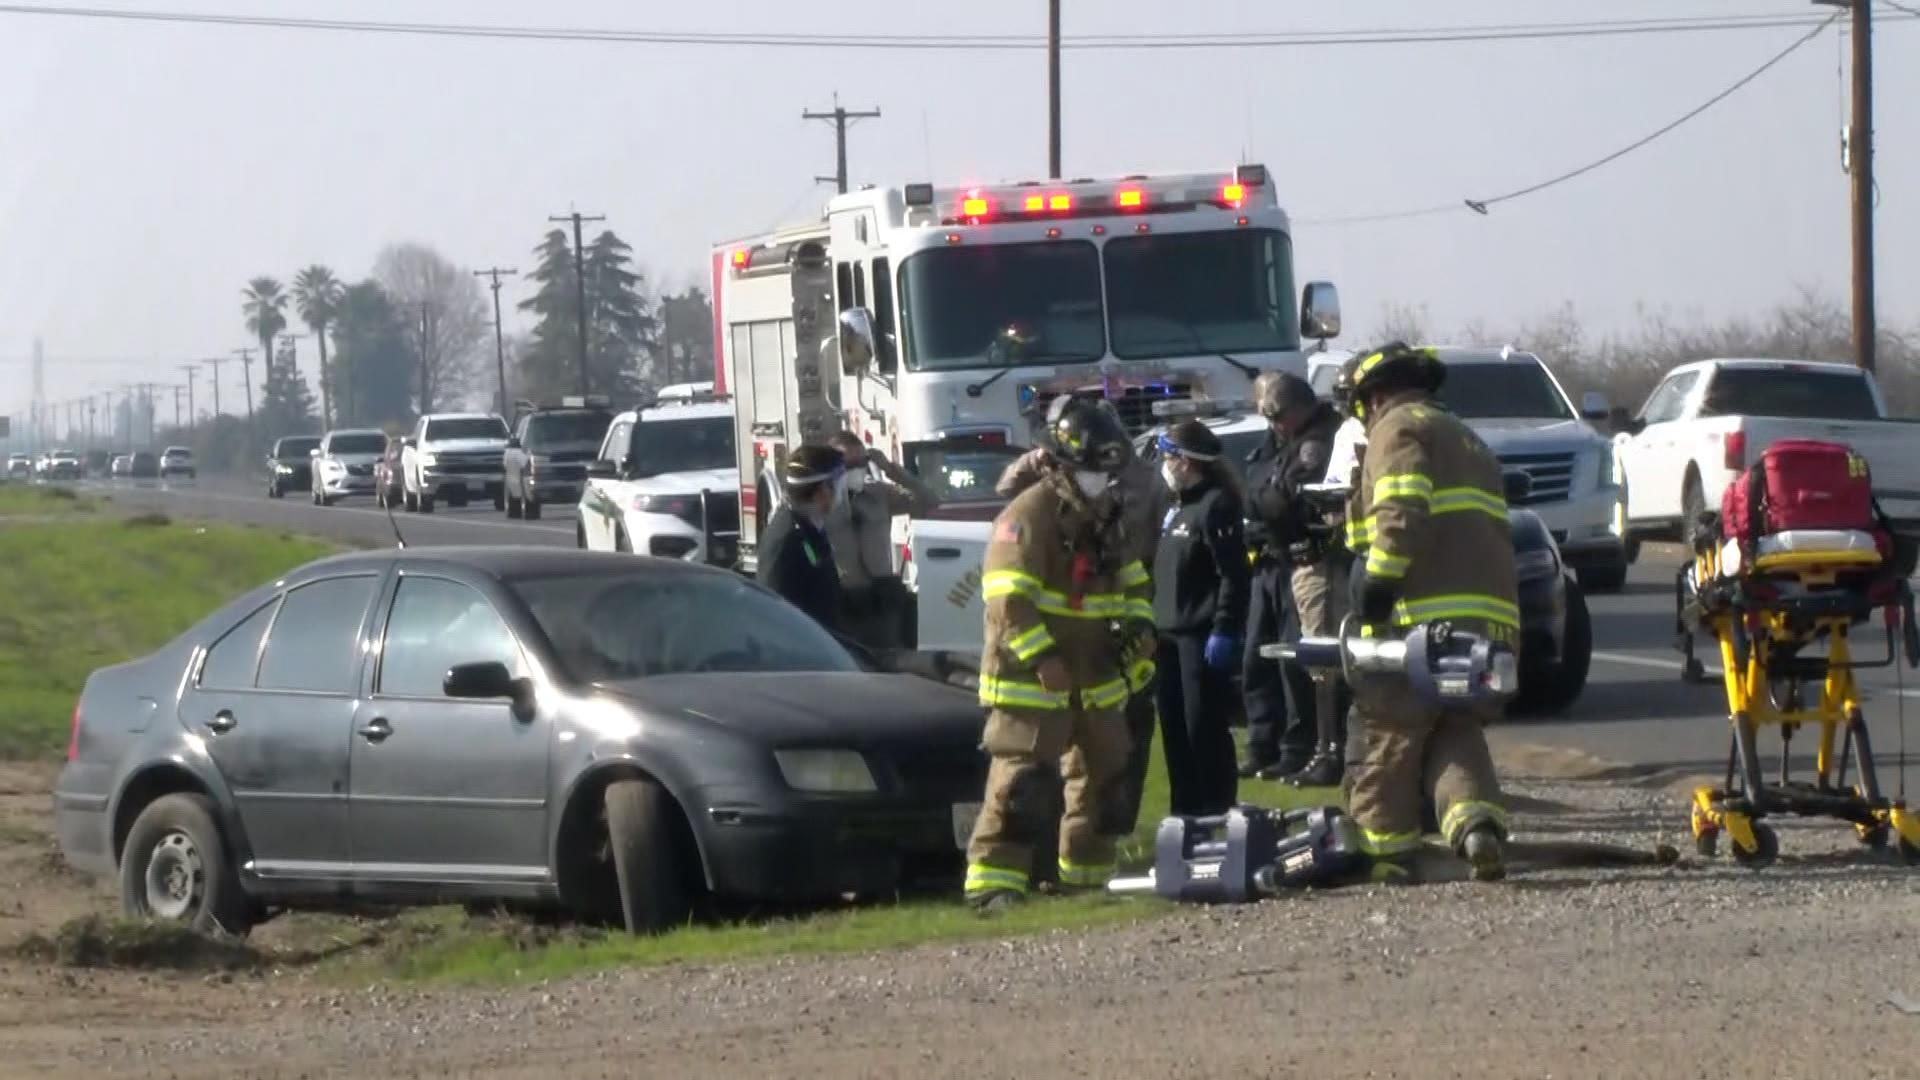 Teen killed in Hwy 180 crash identified